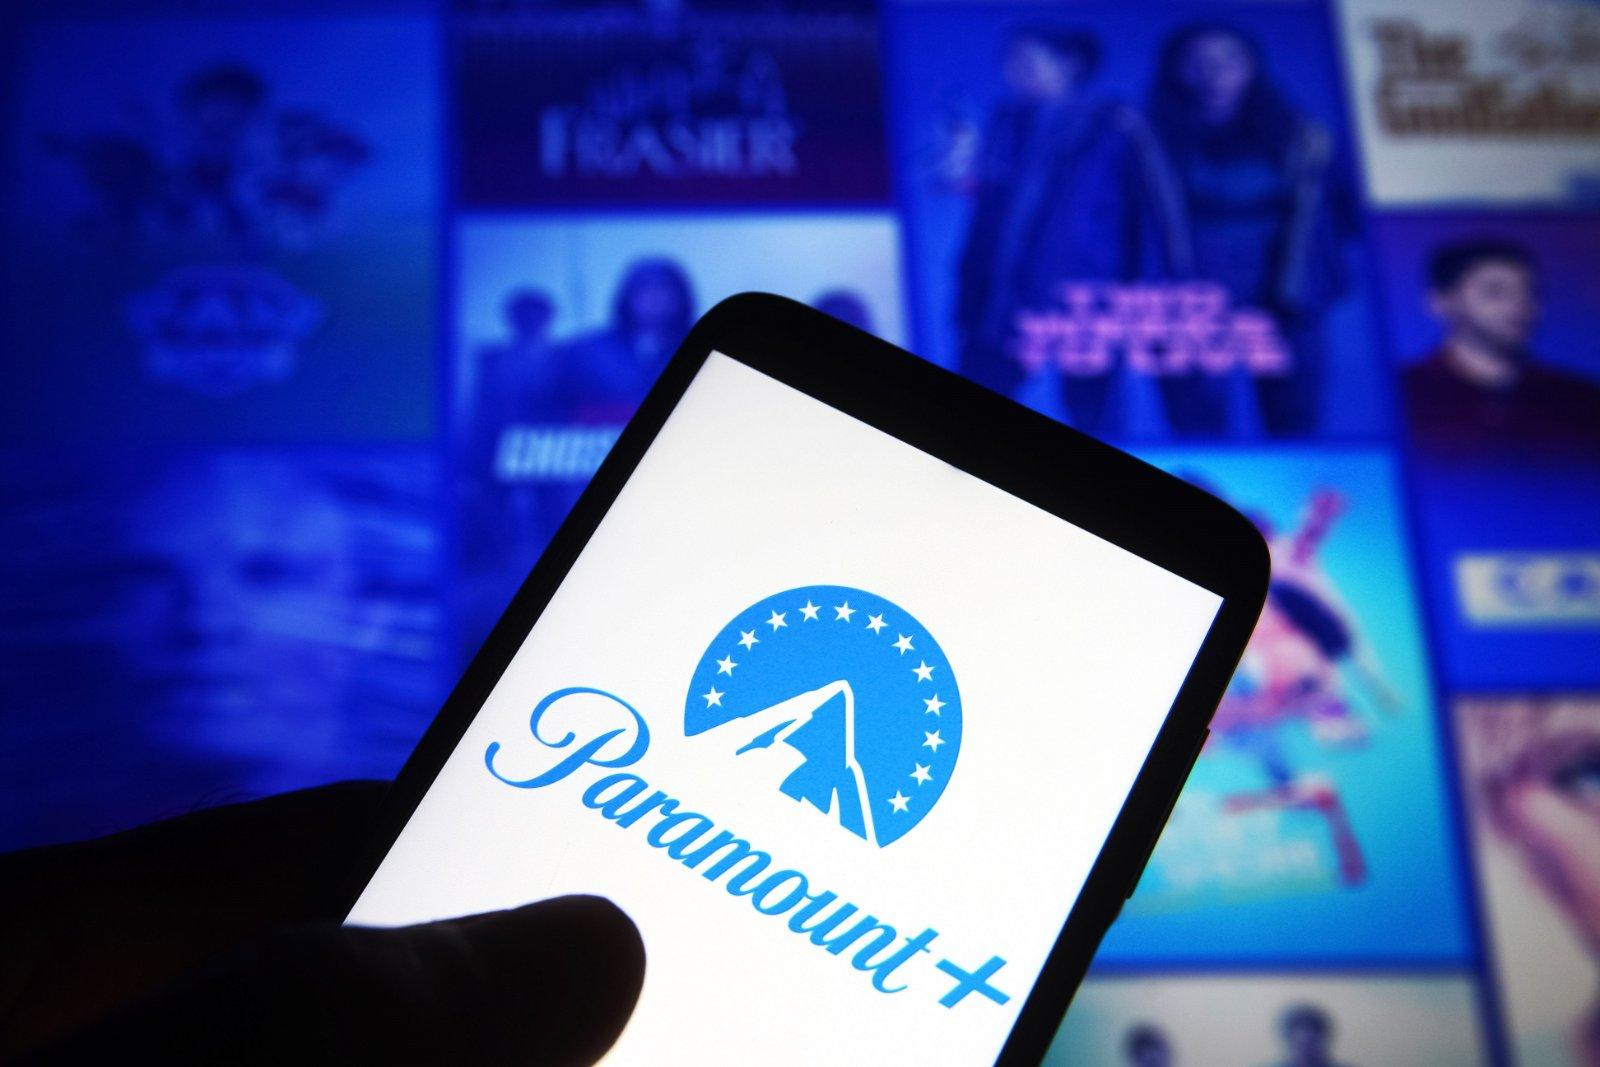 Otro servicio de transmisión que se acerca para 2022 en Europa: Paramount +